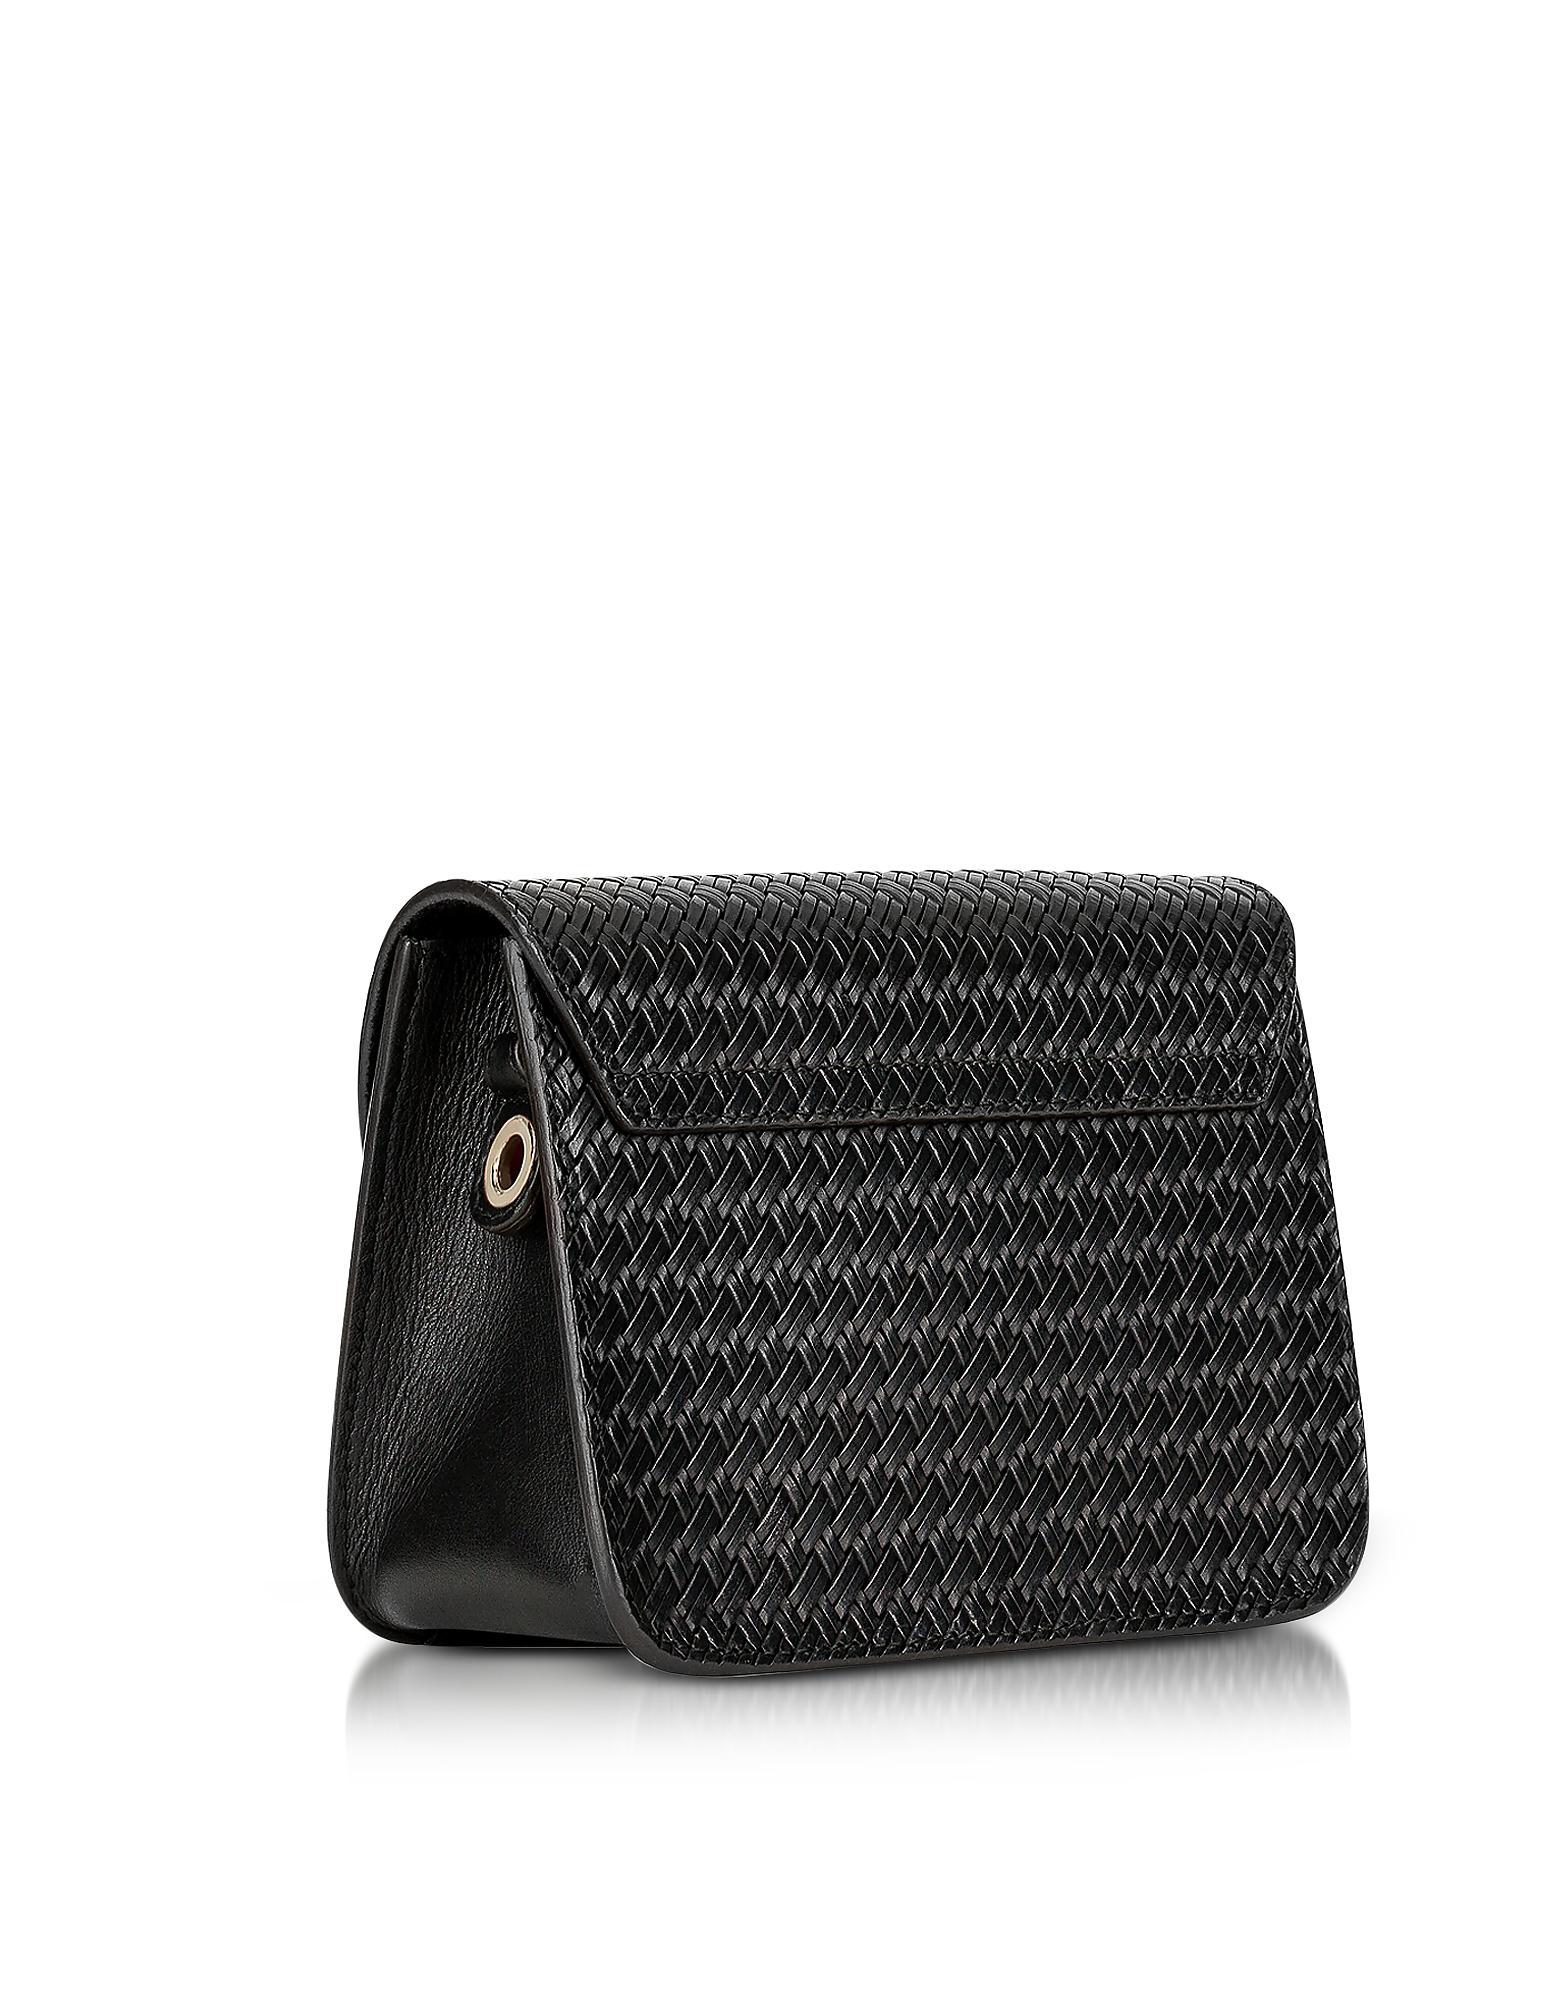 5826beb521b Lyst - Furla Onyx Woven Leather Metropolis Gilda Mini Crossbody Bag ...